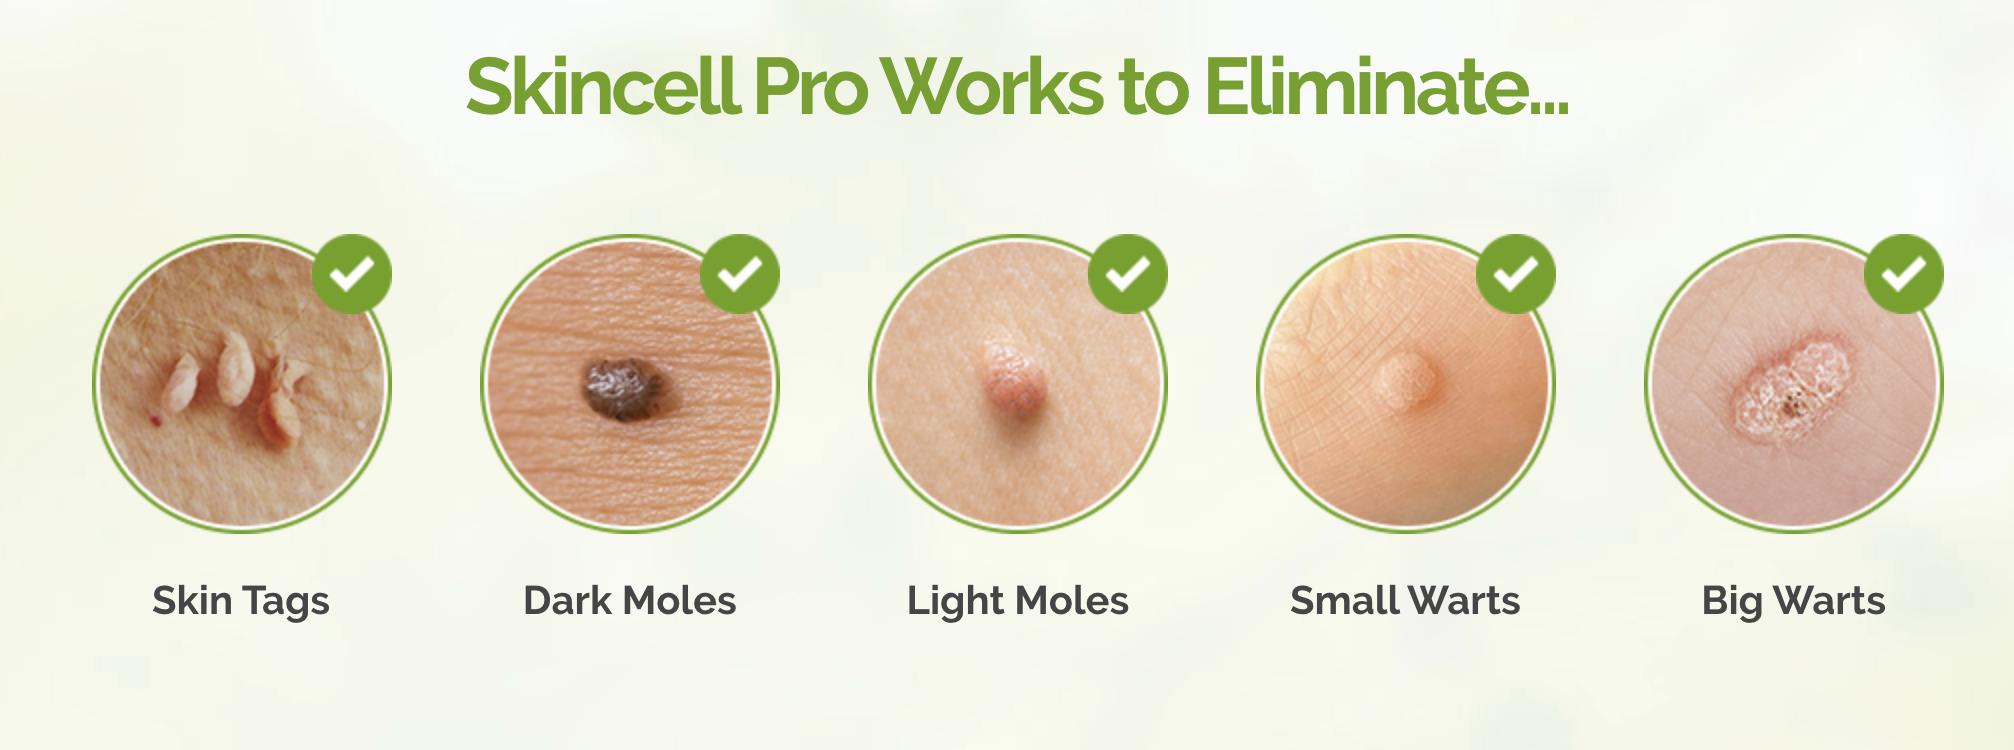 skincell remove warts » EstheticsHUB.com